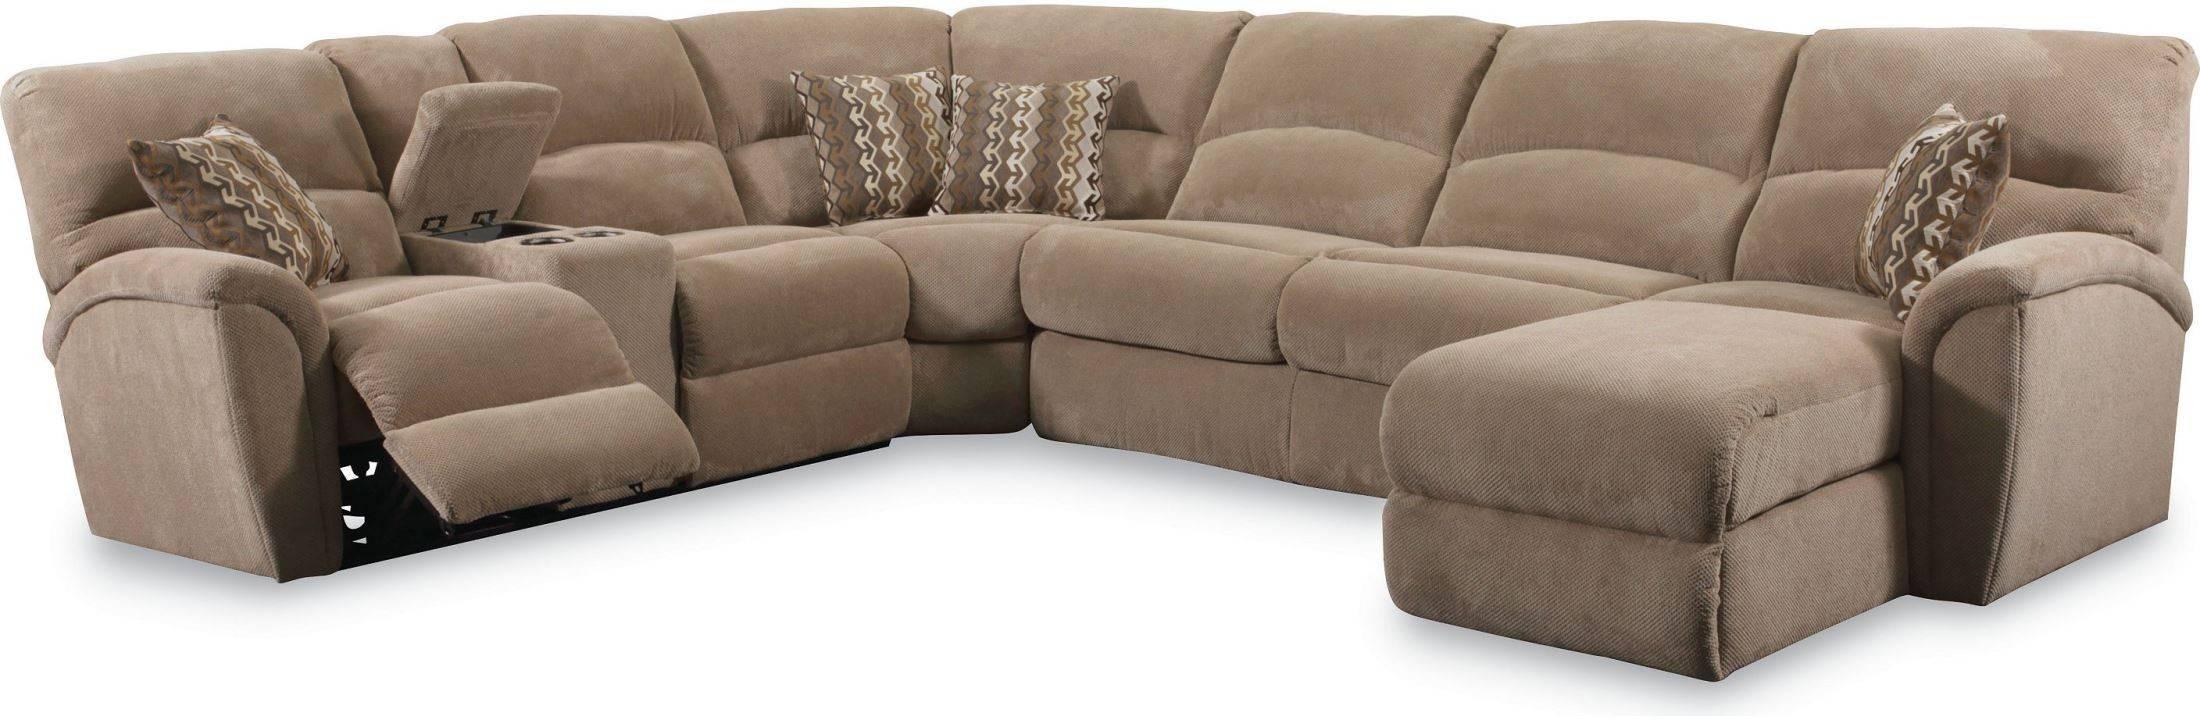 Grand Torino Reclining Sectional From Lane | Coleman Furniture with regard to Lane Furniture Sofas (Image 13 of 25)